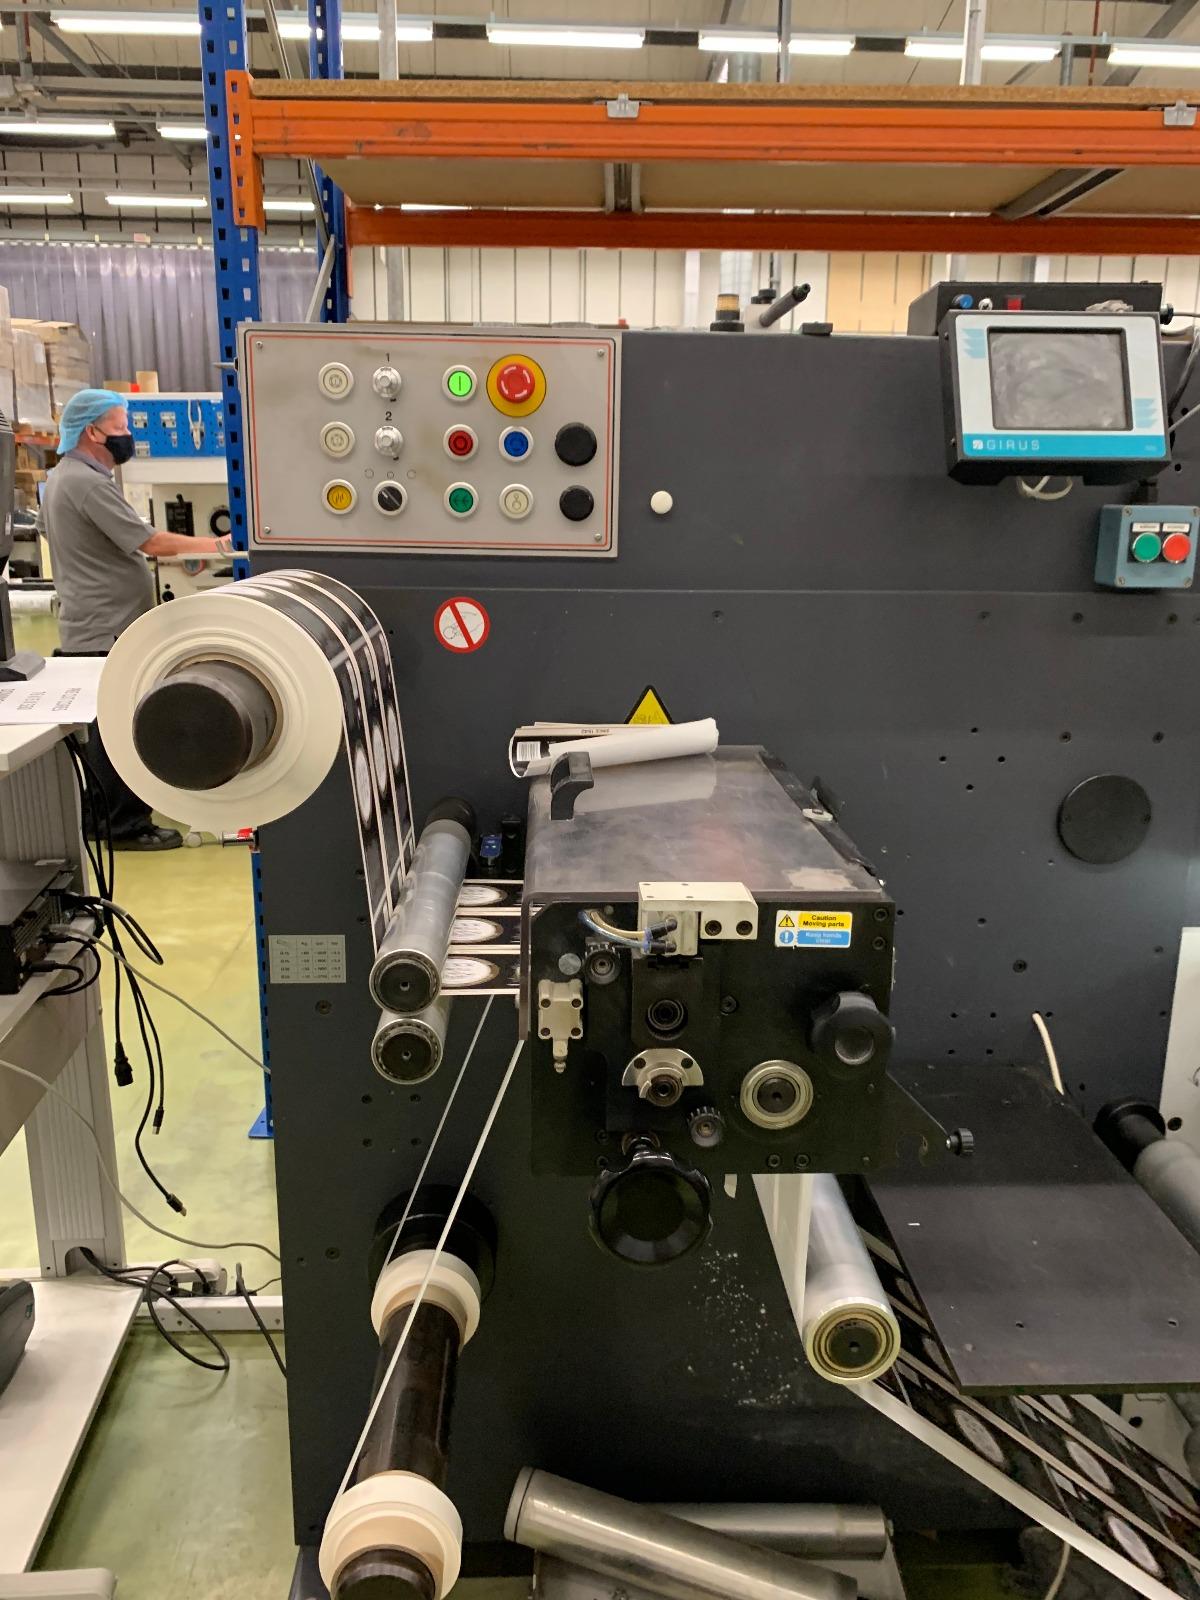 ABG Digicon Series 1 - Used Flexo Printing Presses and Used Flexographic Equipment-3